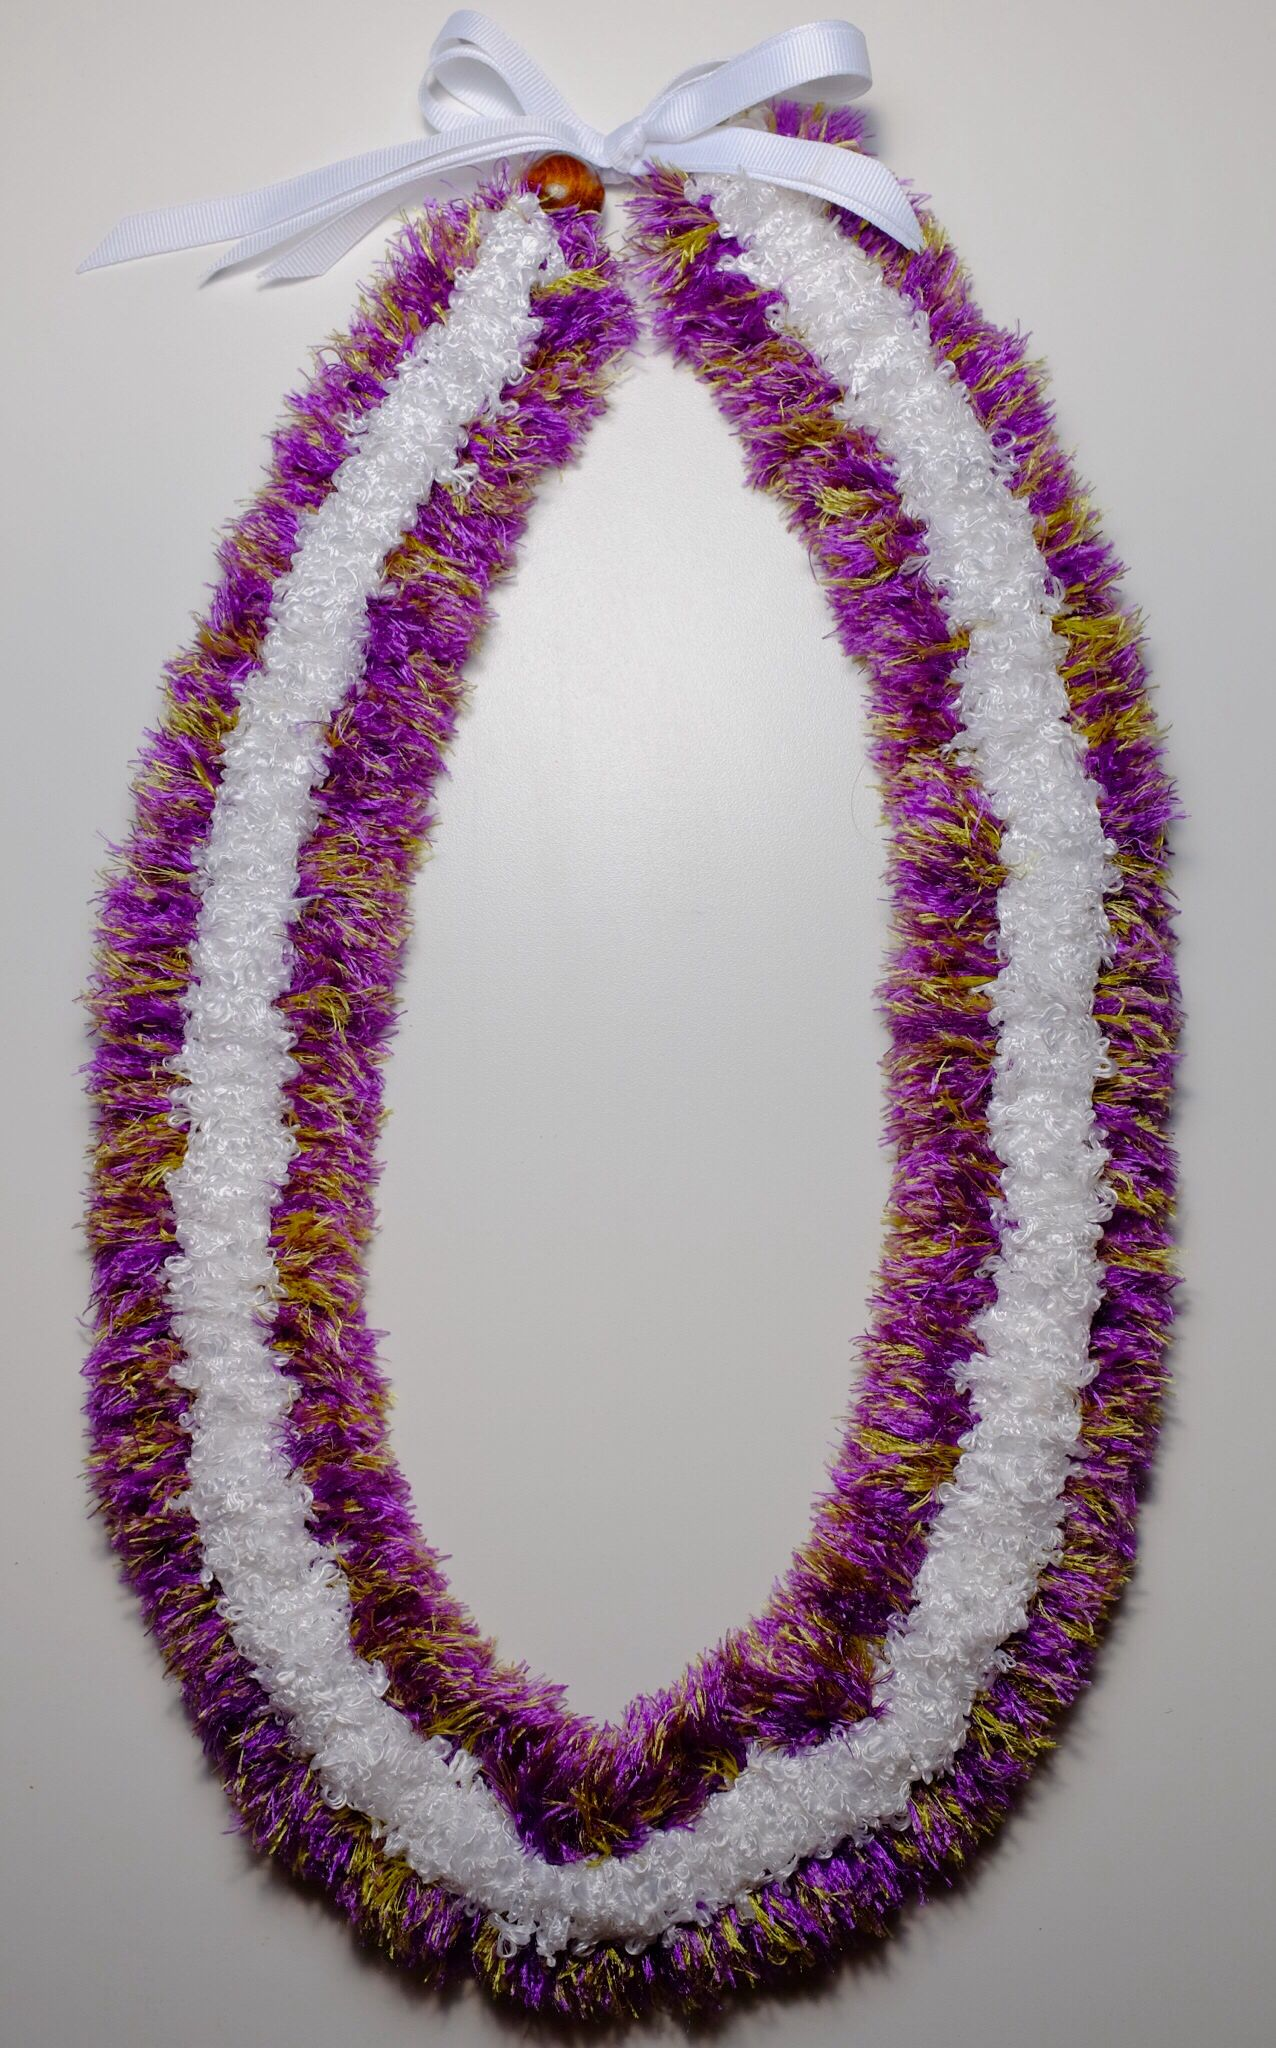 Flat three straw lei made with purple and fern colored eyelash yarn flat three straw lei made with purple and fern colored eyelash yarn and white kalina at izmirmasajfo